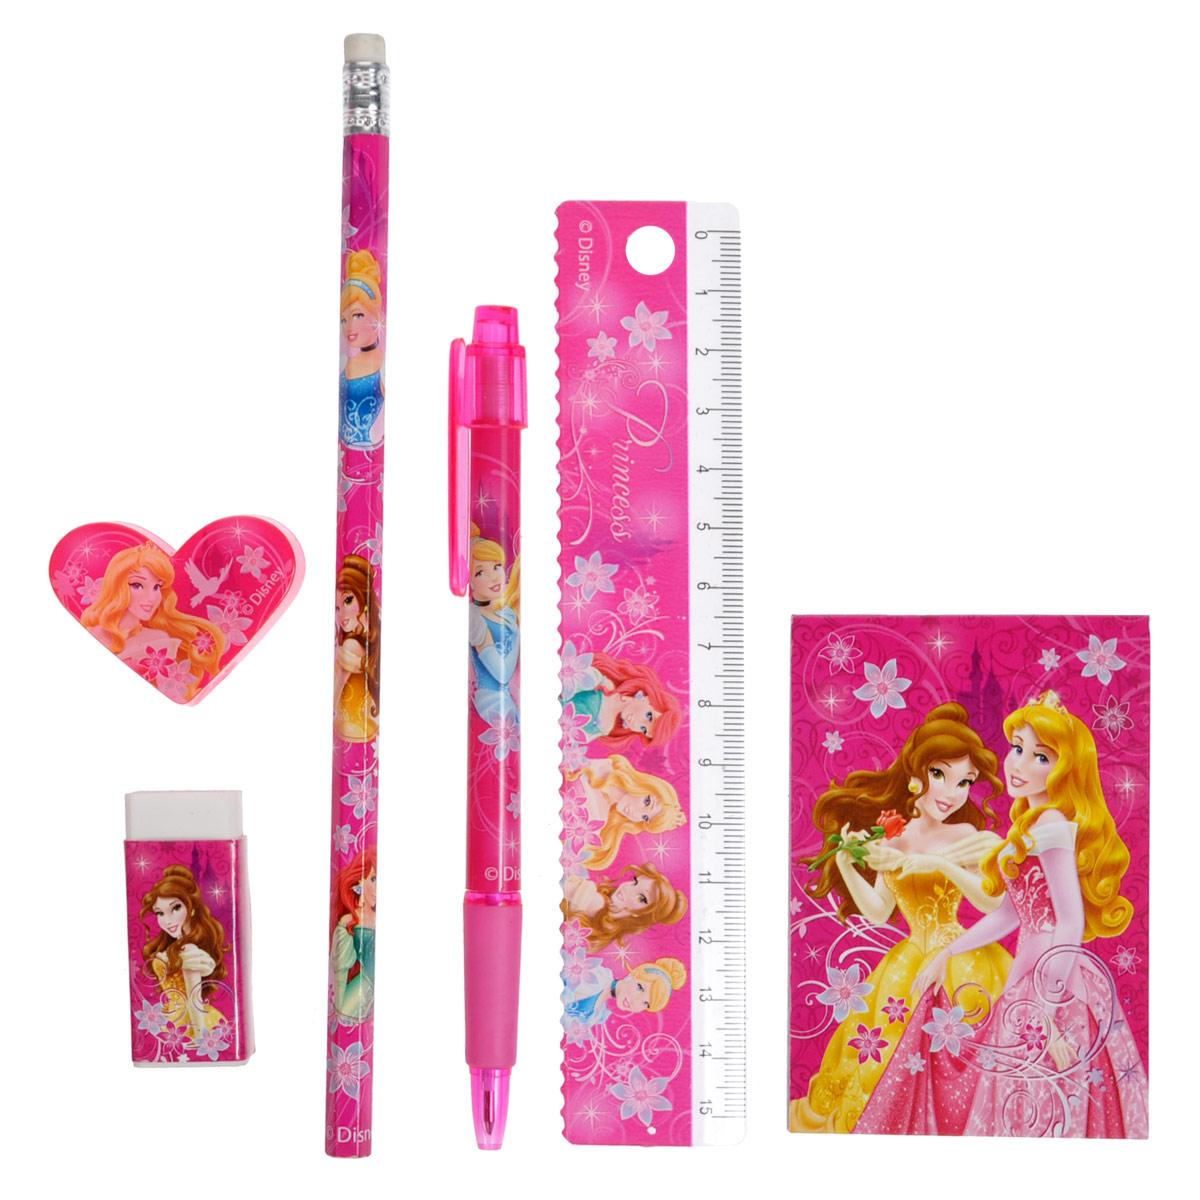 Канцелярский набор  Princess , 7 предметов -  Канцелярские наборы